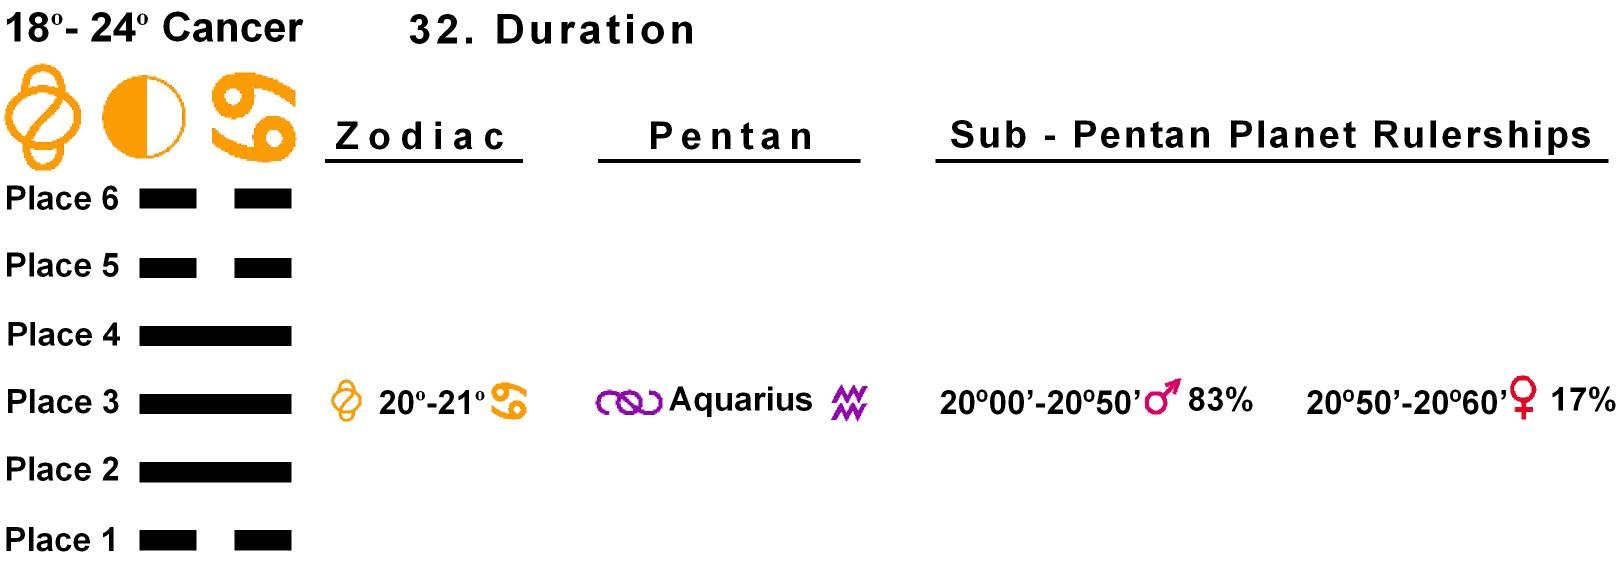 Pent-lines-04CA 20-21 Hx-32 Duration